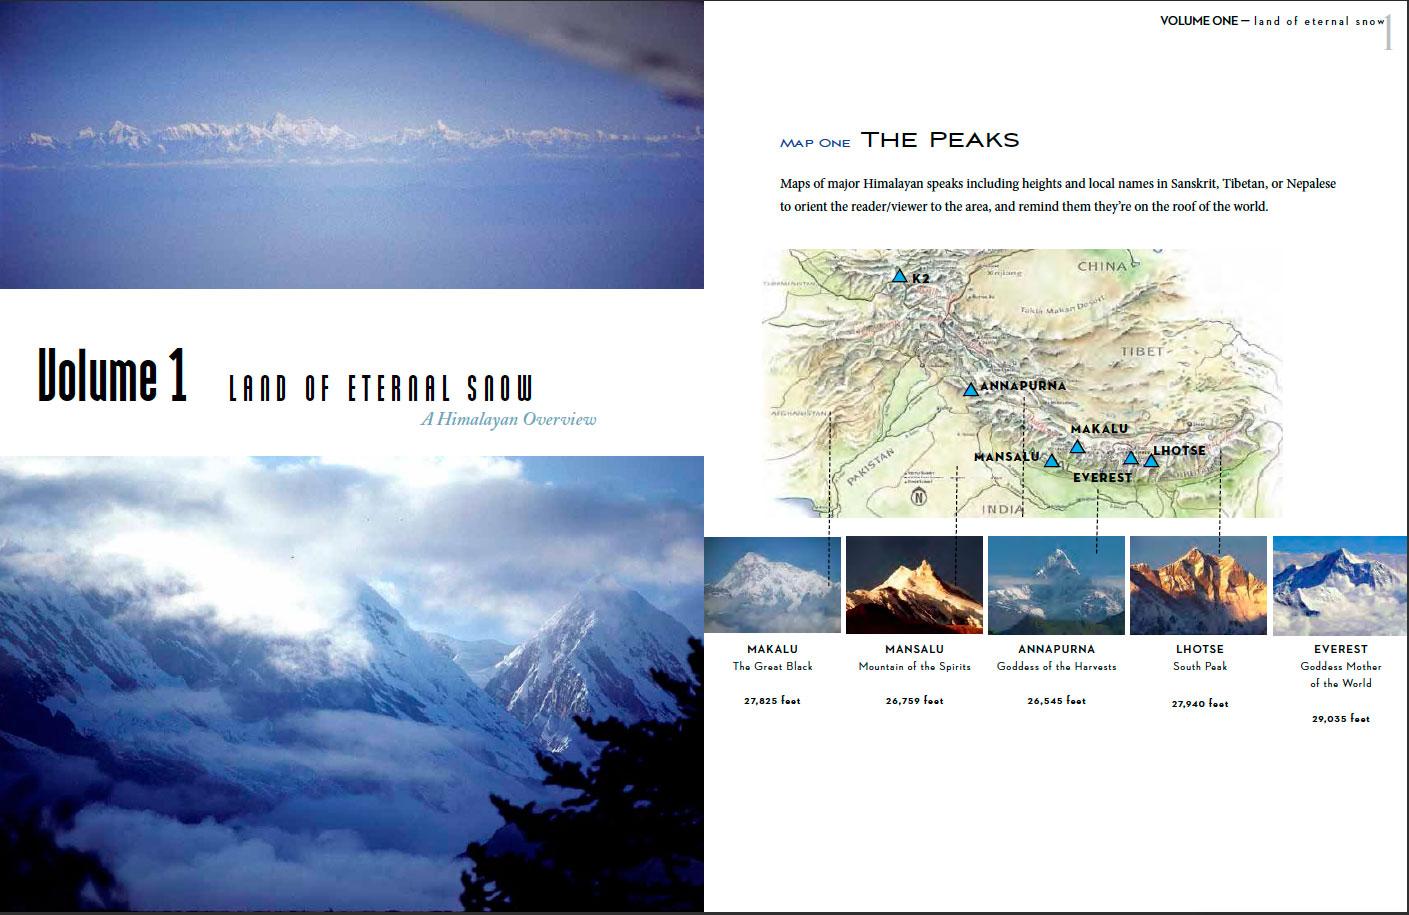 Peter-himalayas-spread-2-OP.jpg